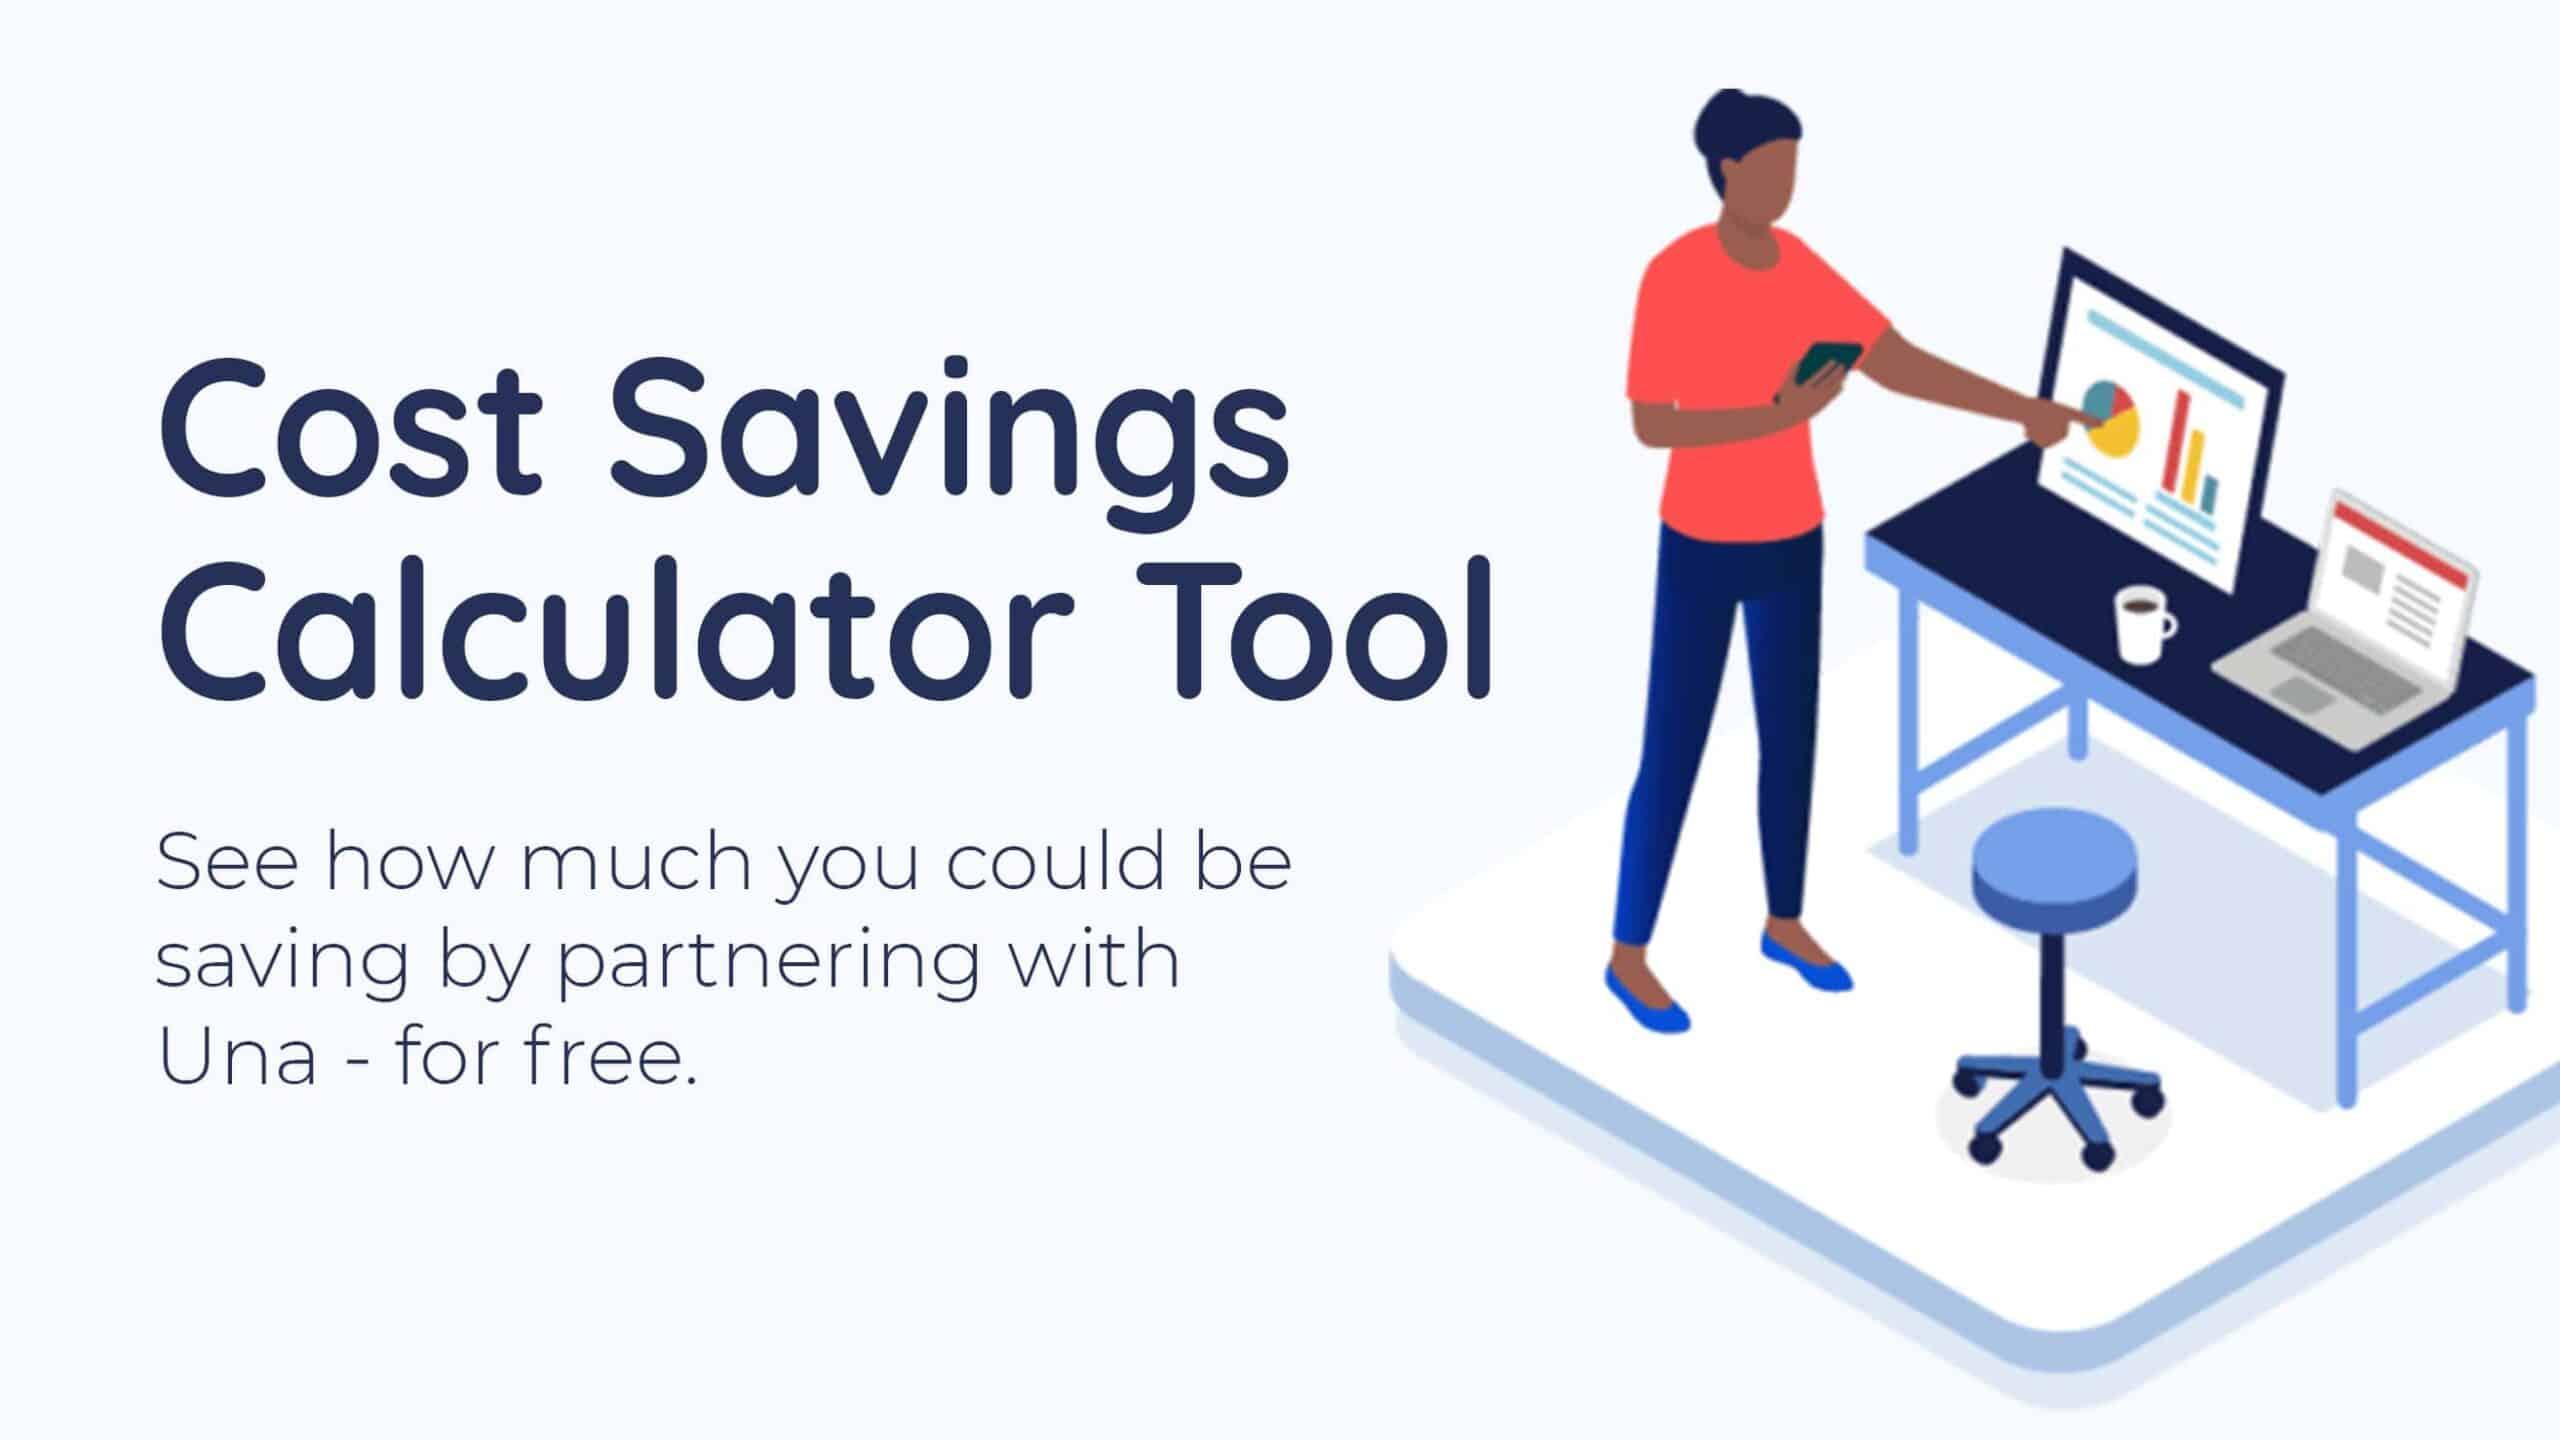 group purchasing calculator tool